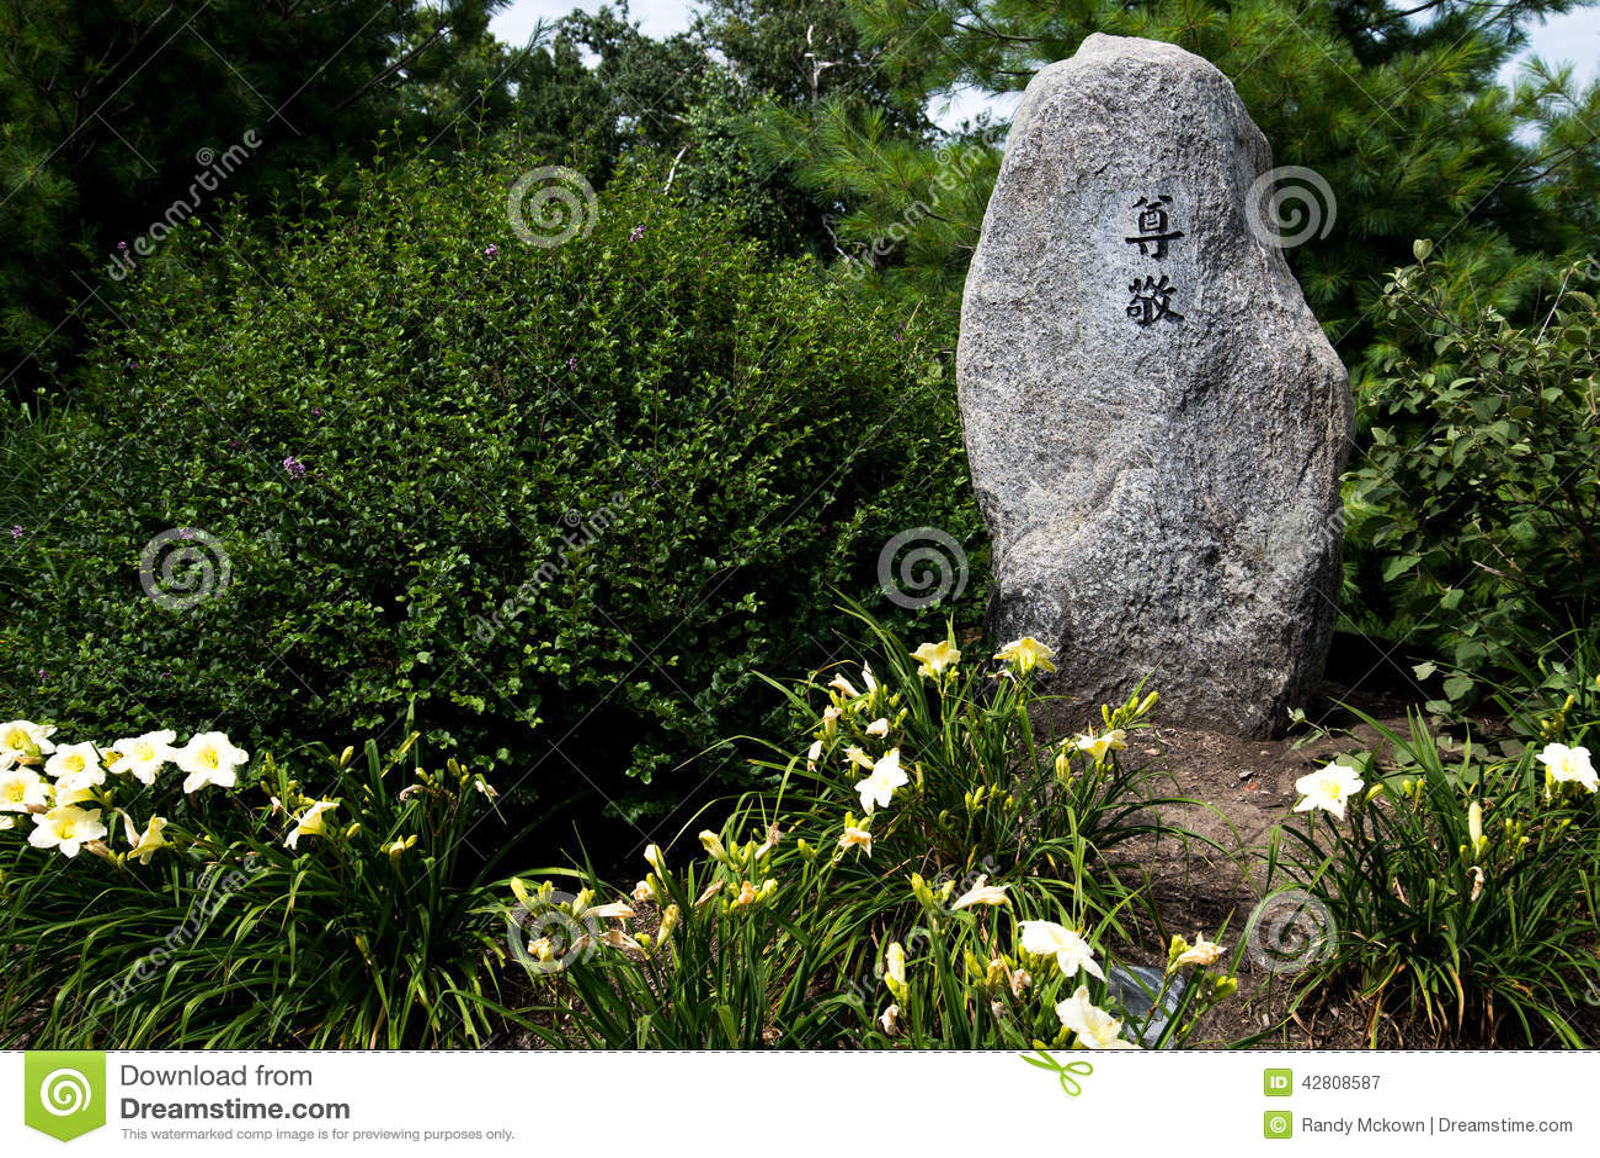 Japanese Rock Garden Stock Image Image Of Garden Oriental 42808587